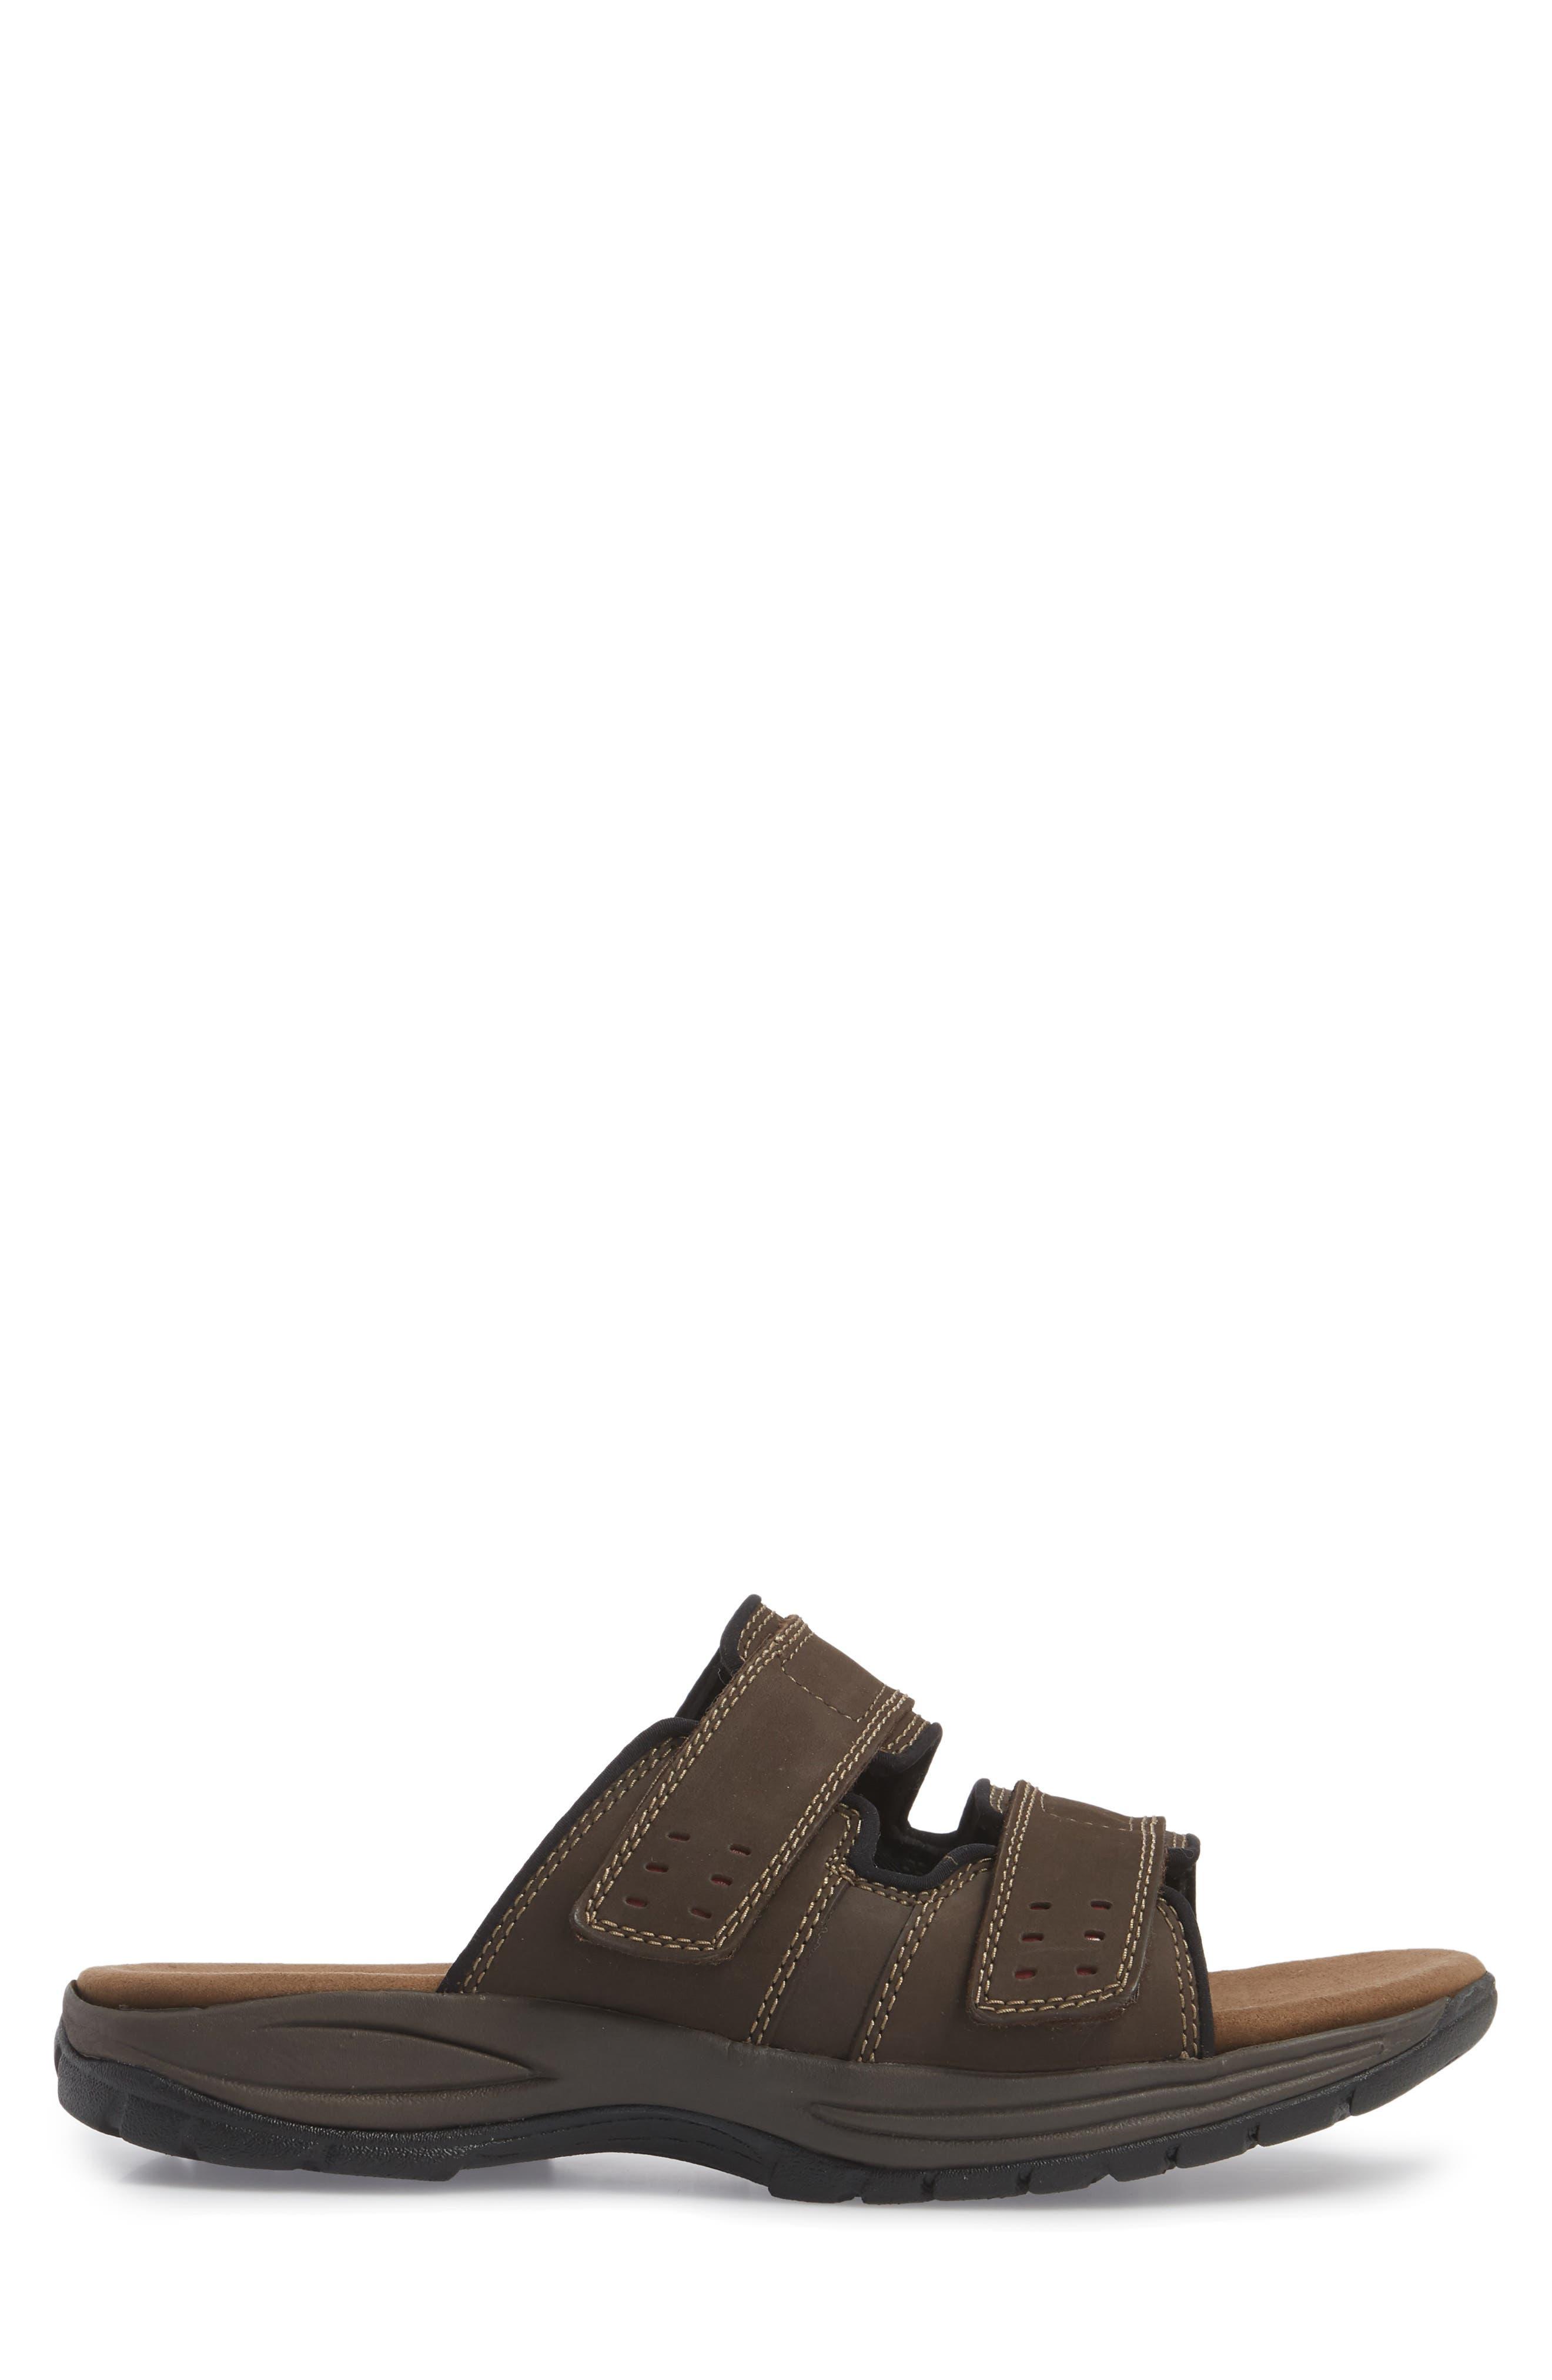 Newport Slide Sandal,                             Alternate thumbnail 3, color,                             DARK BROWN LEATHER